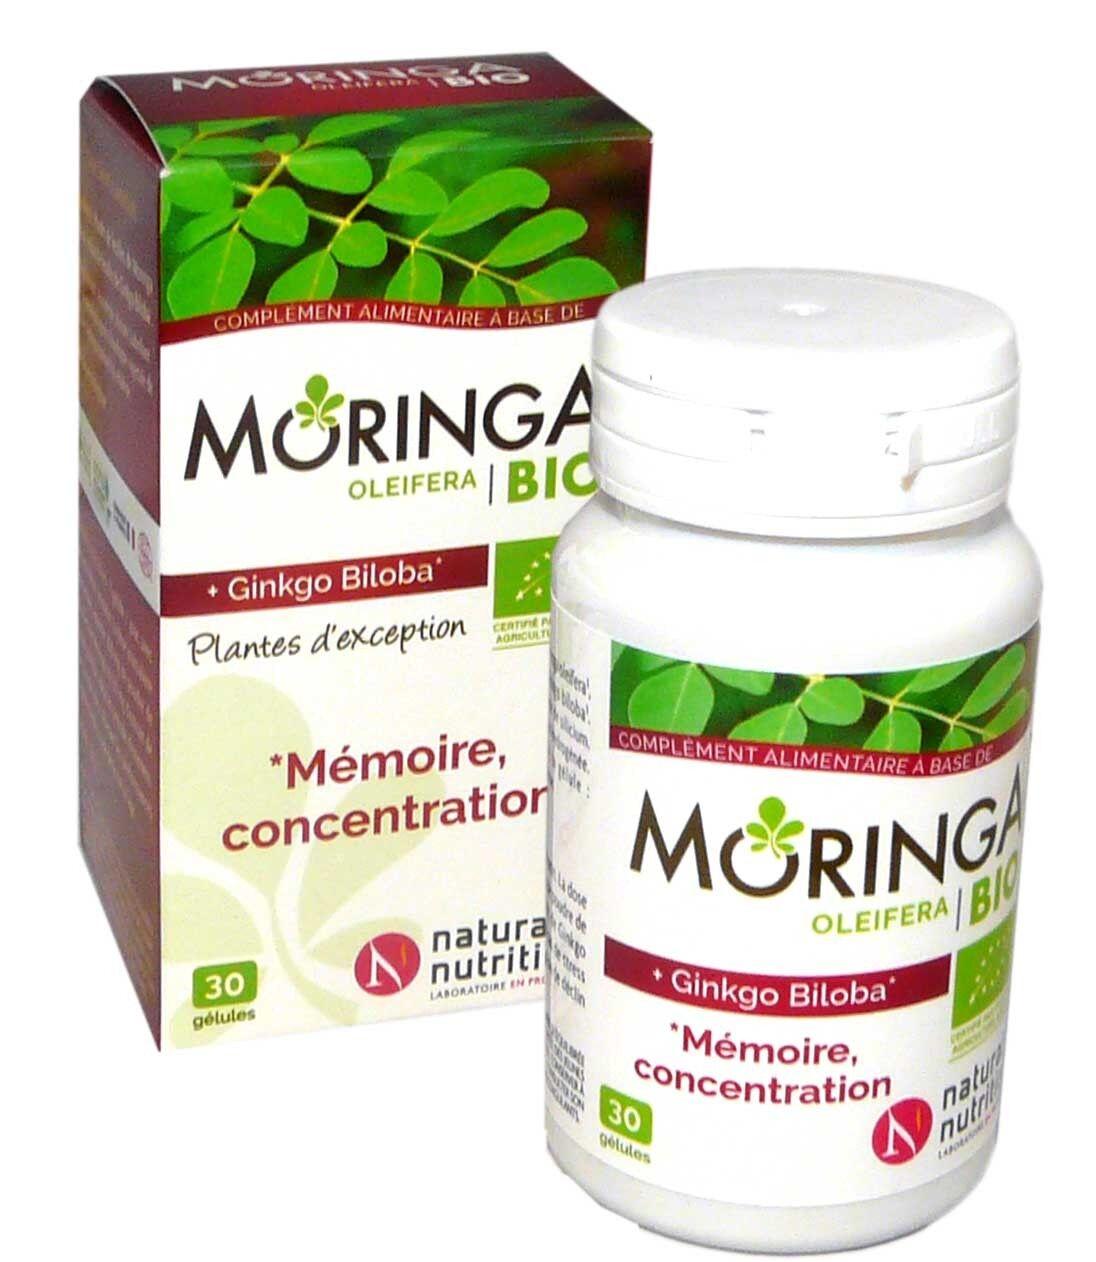 Natural nutrition moringa bio memoire concentration 30 gelules